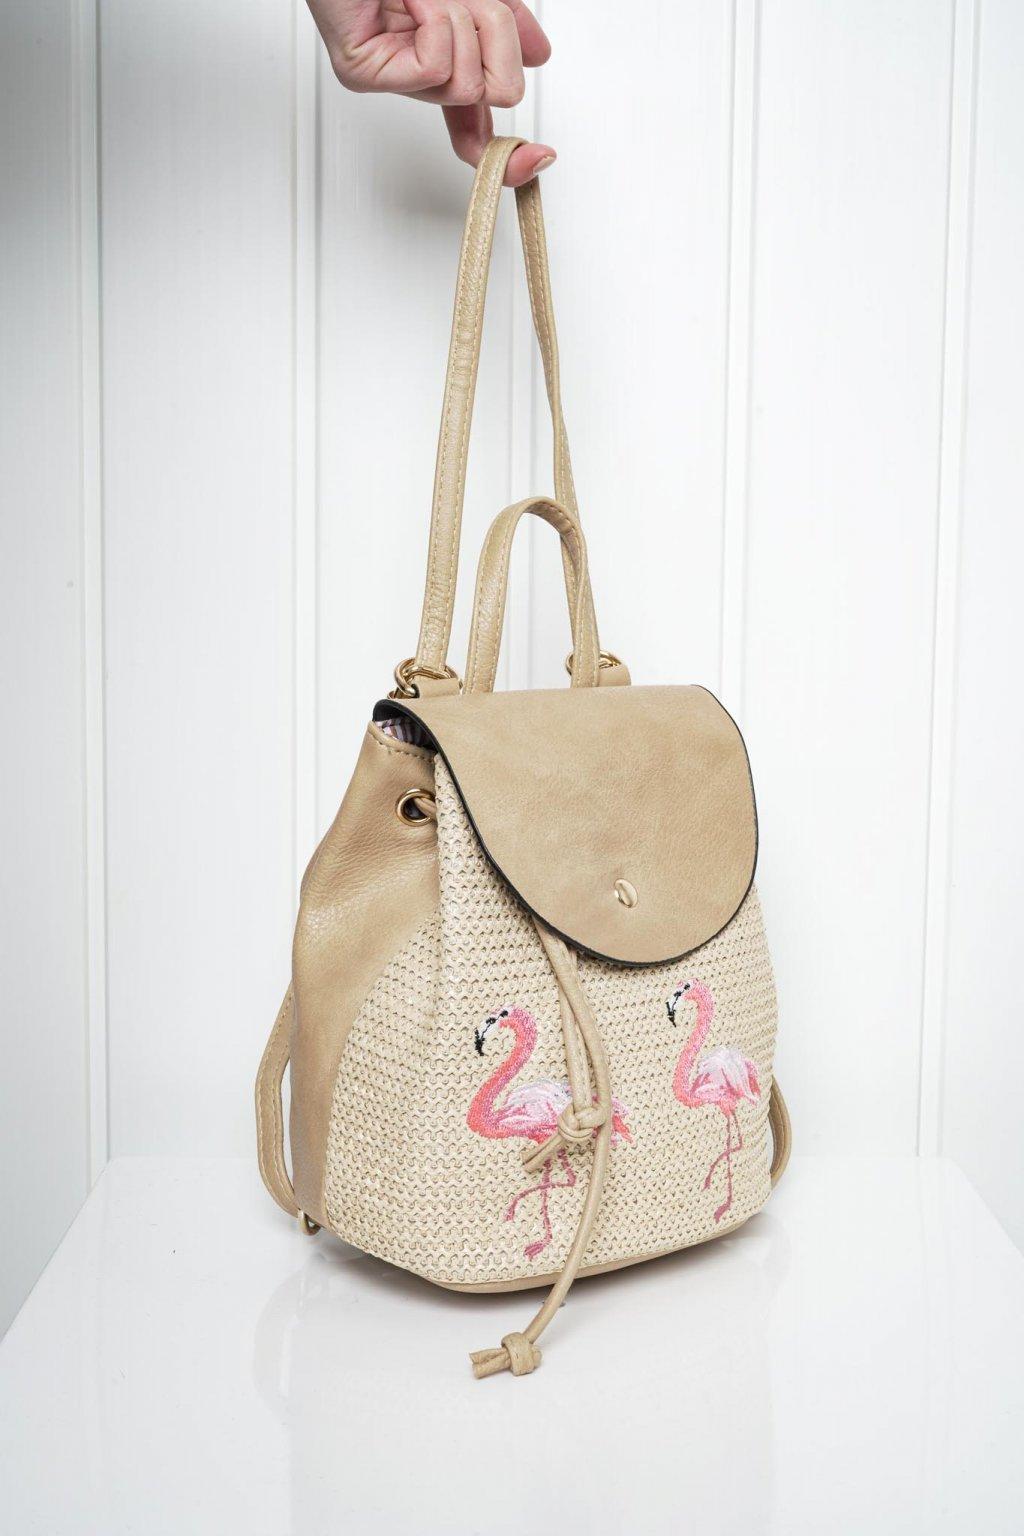 Kabelka, crossbody, ruksak, shopping bag, shopperka, 103